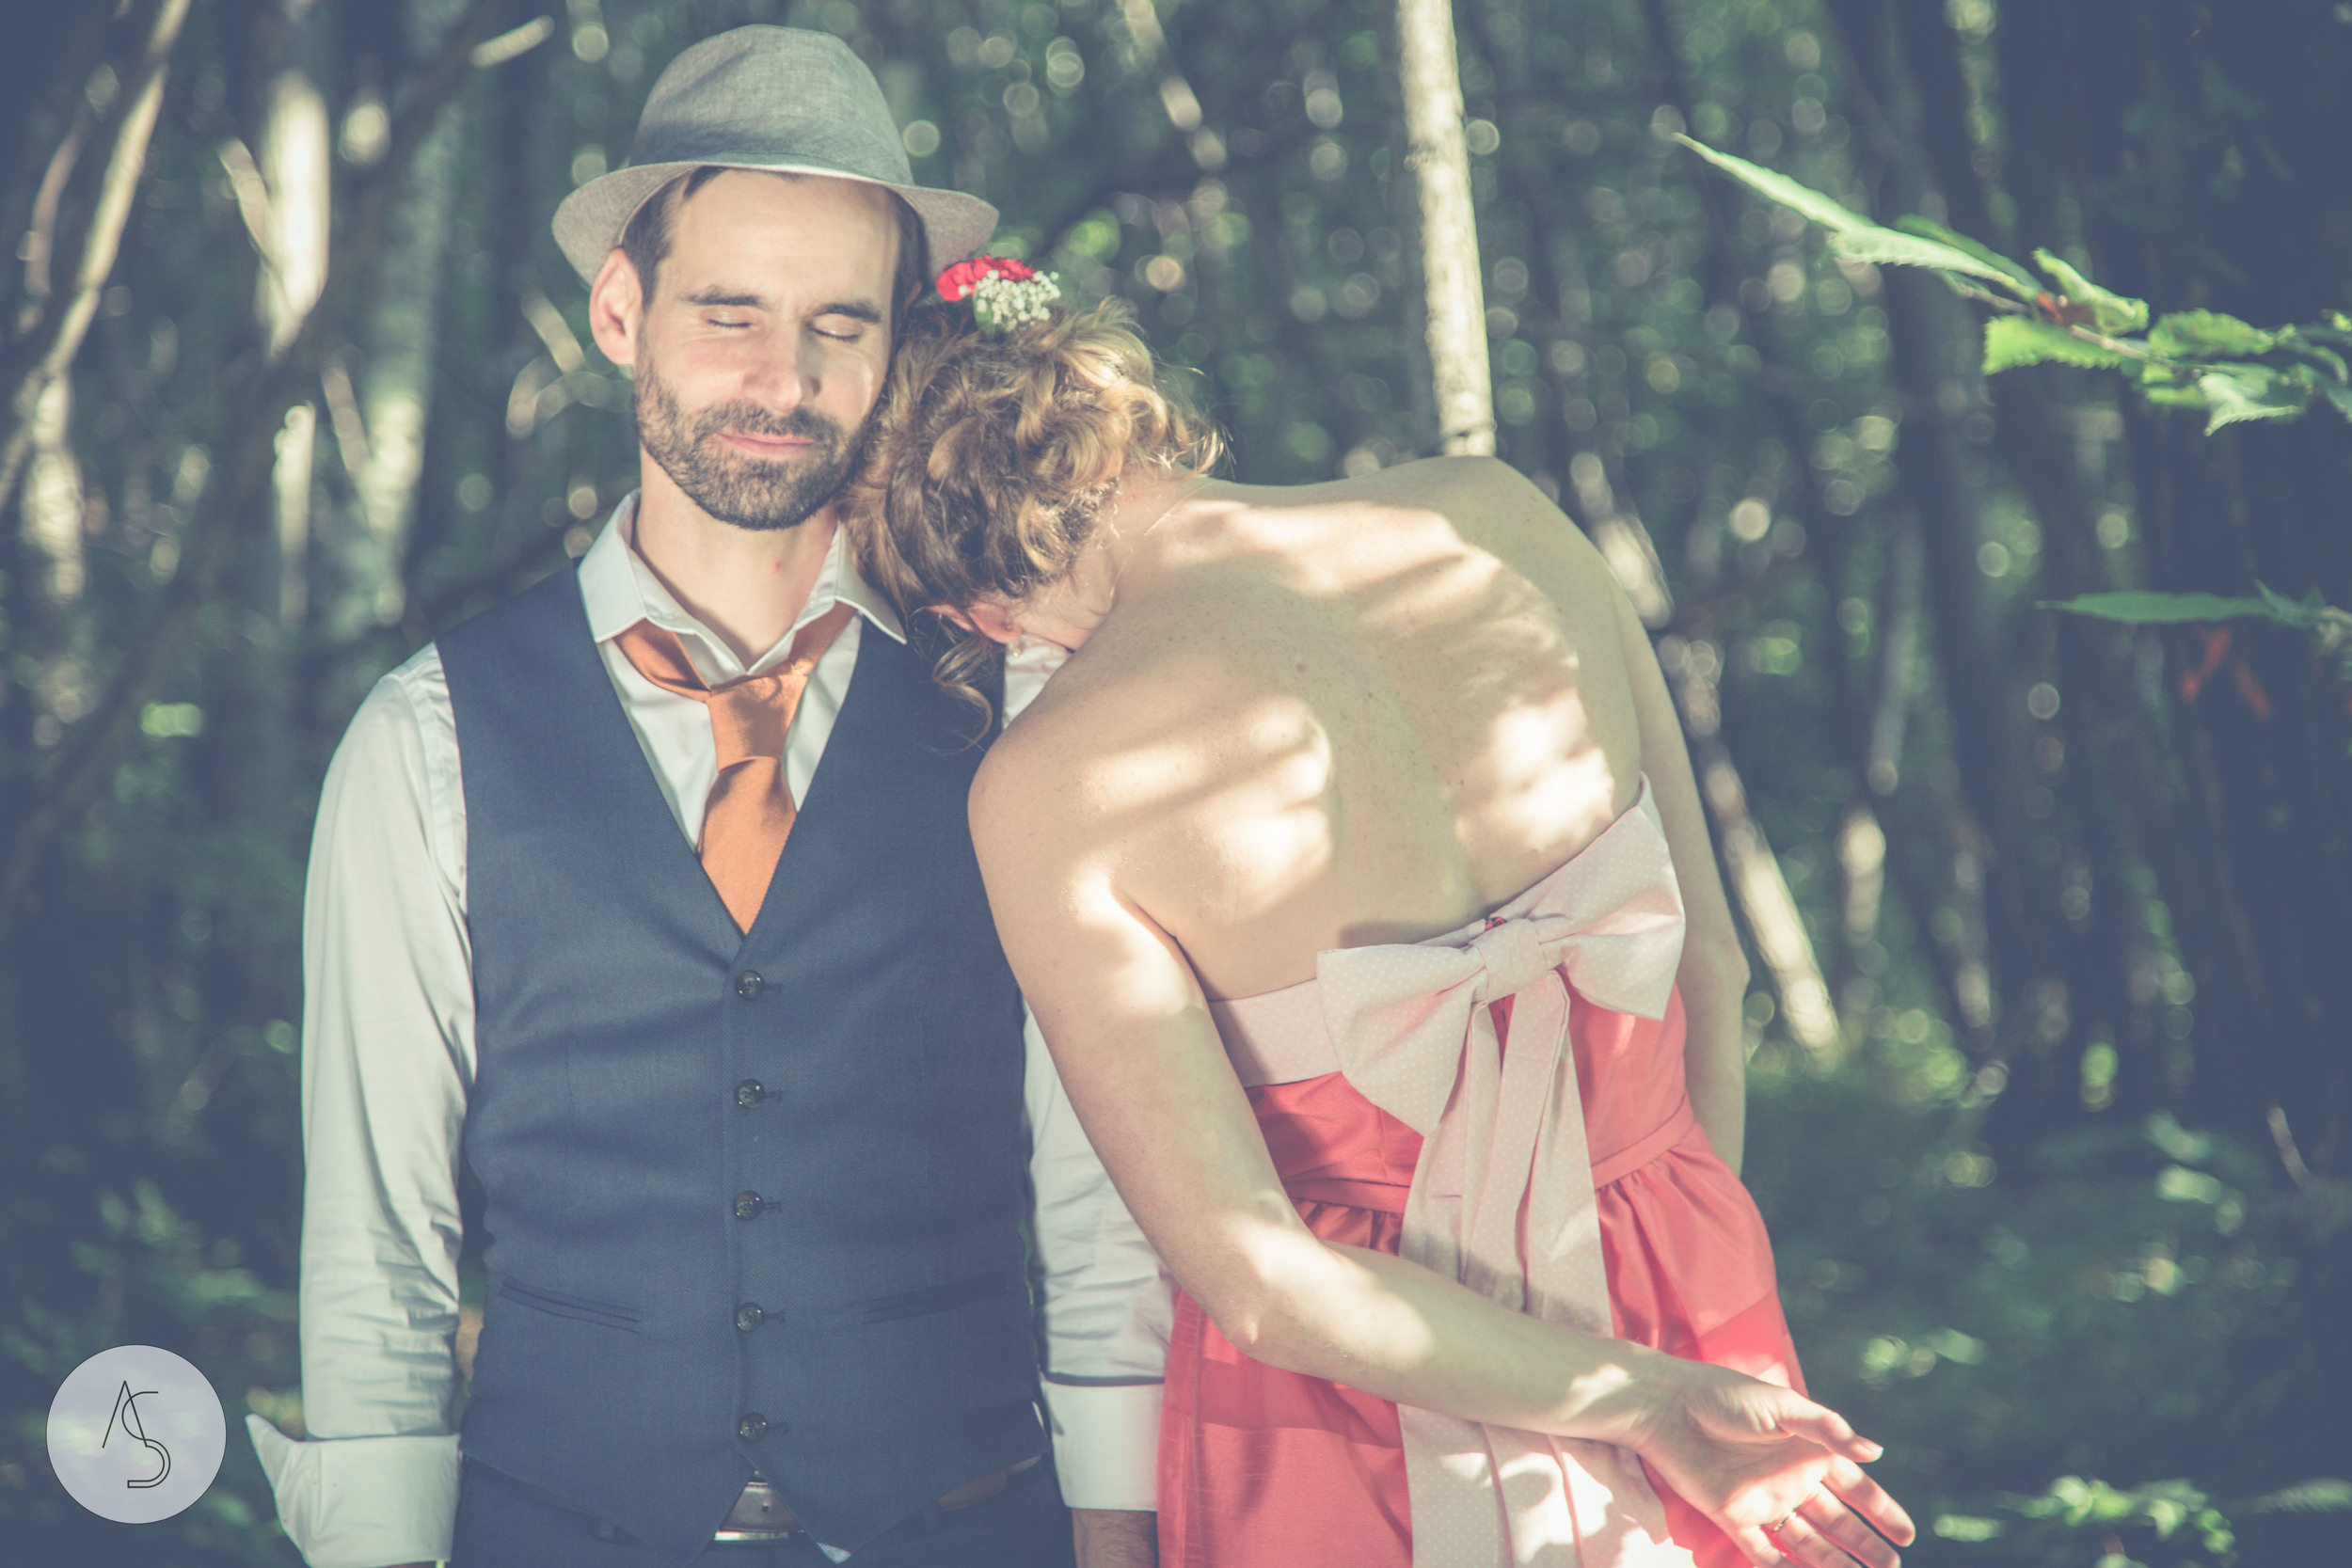 photographe mariage - Grenoble - Rhone Alpes - Adriana Salazar photo-93.jpg